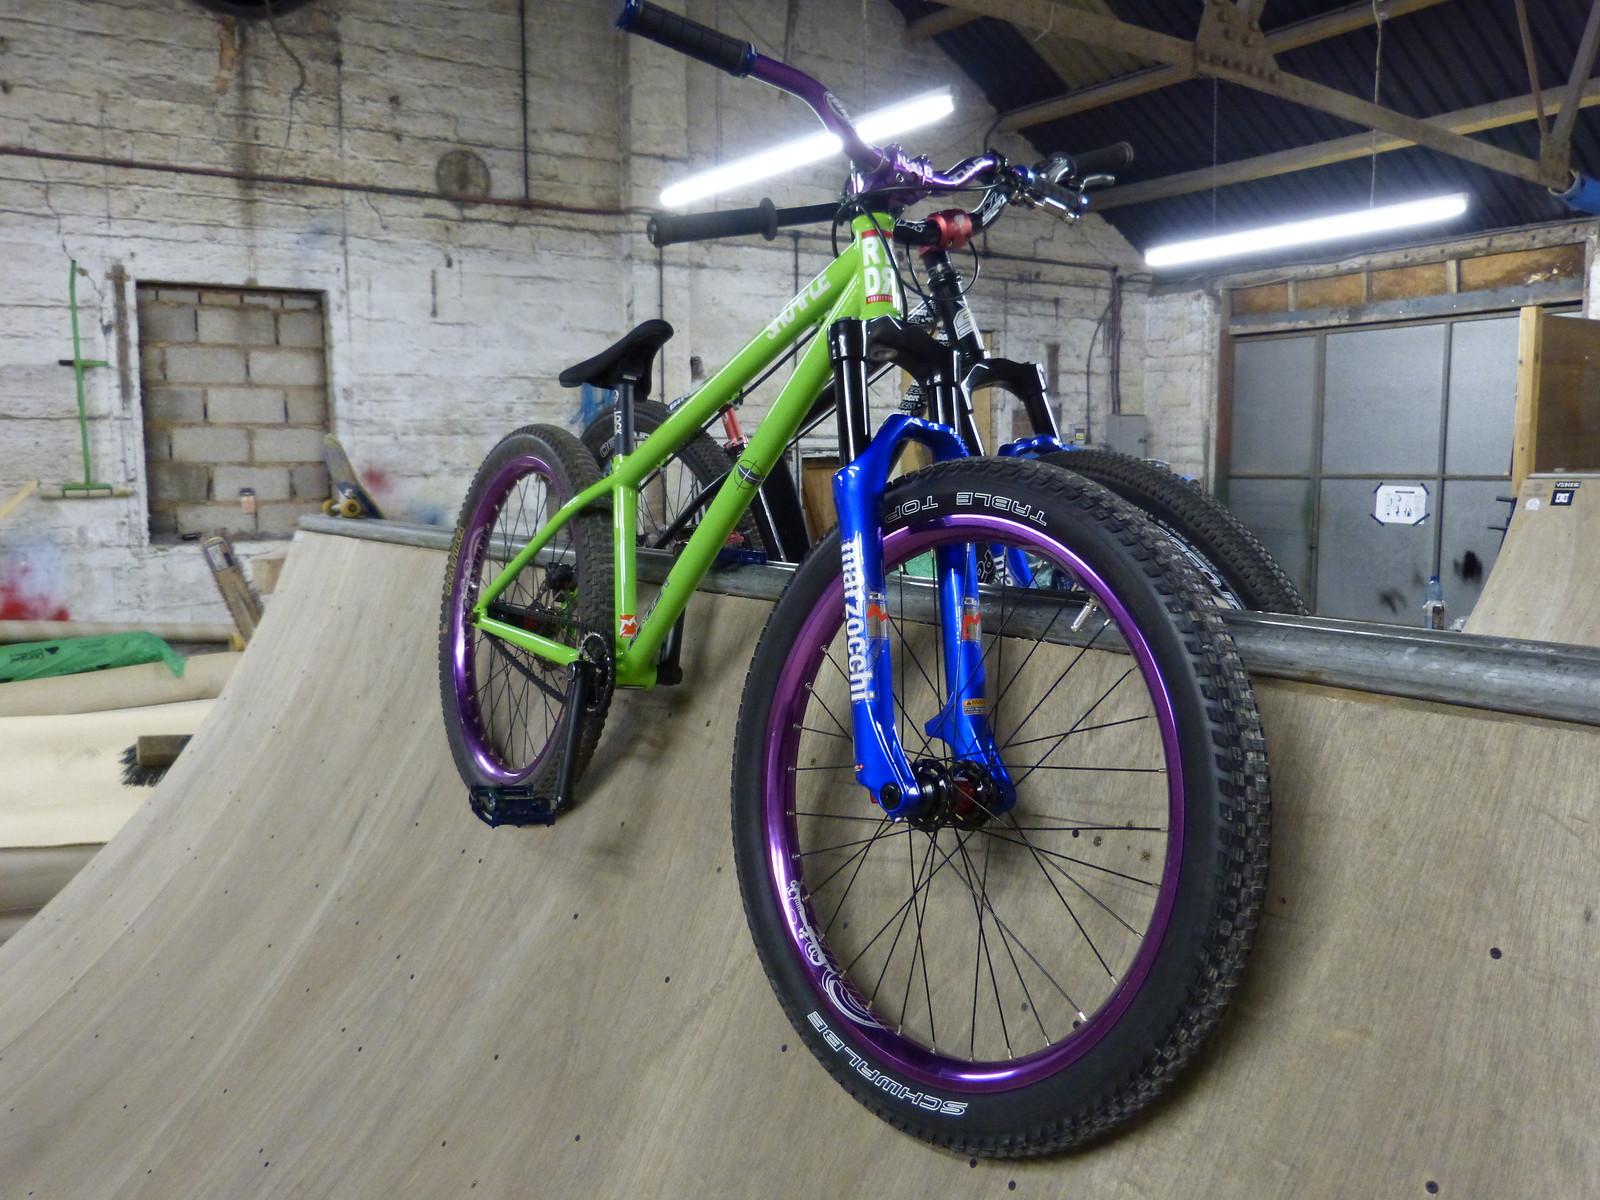 Nookie Shuffle - 2013 Jump bike